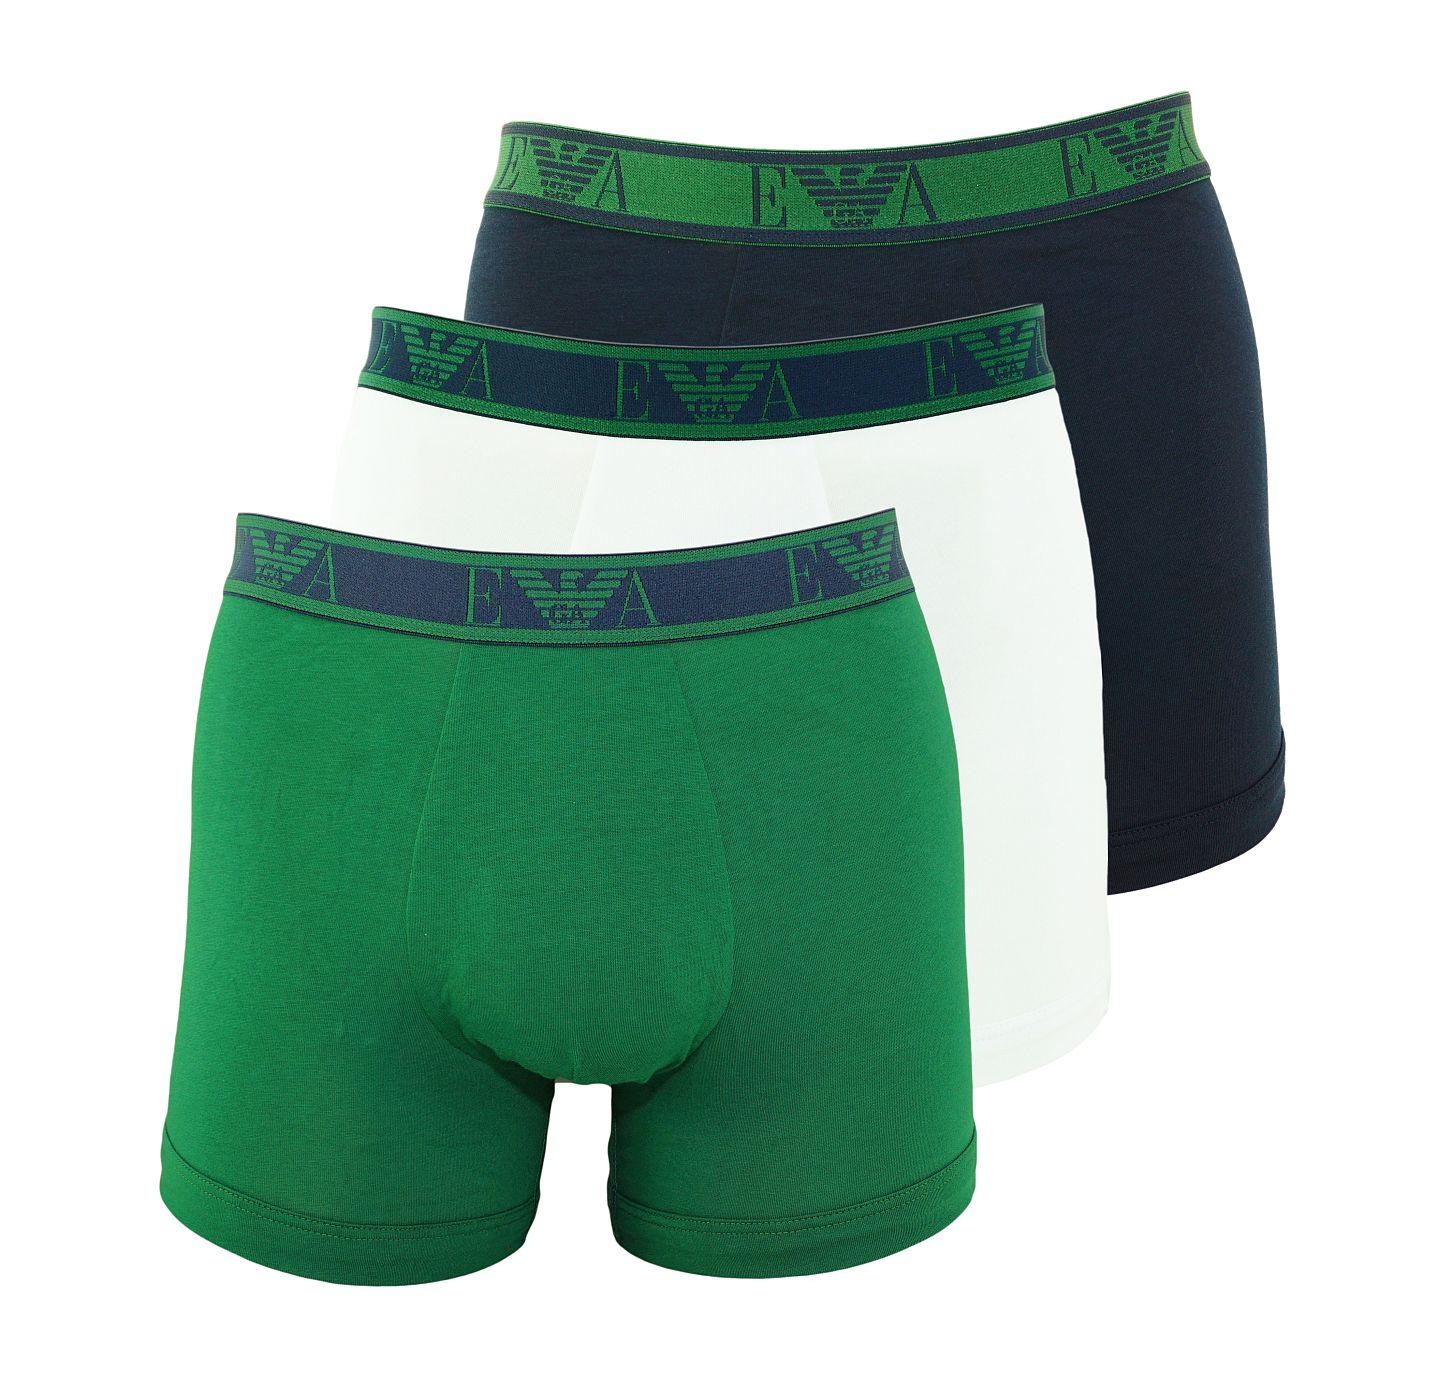 Emporio Armani 3er Pack Boxer Boxershorts 111473 8A715 54635 MARINE/SMERALDO/BCO SH18-AB1